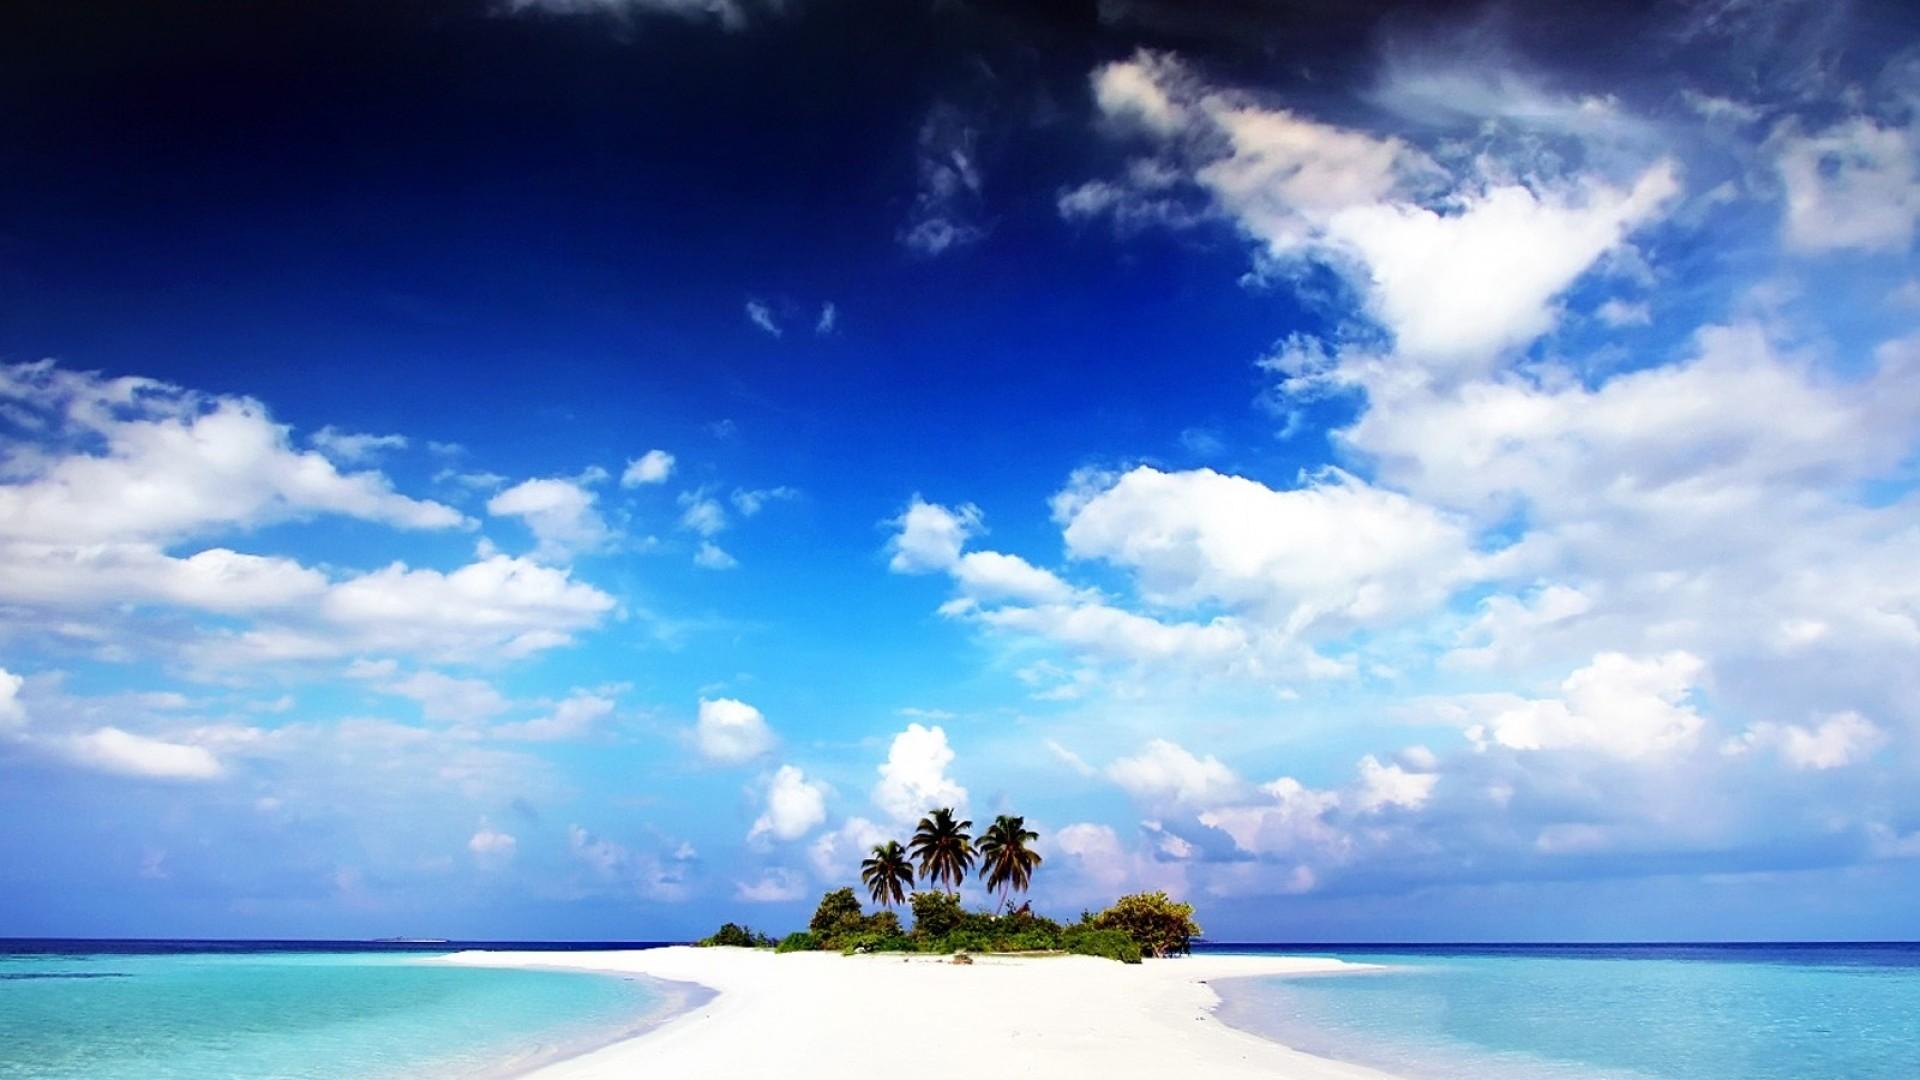 Wallpaper beach, palm trees, sand, island, land, water, gulf